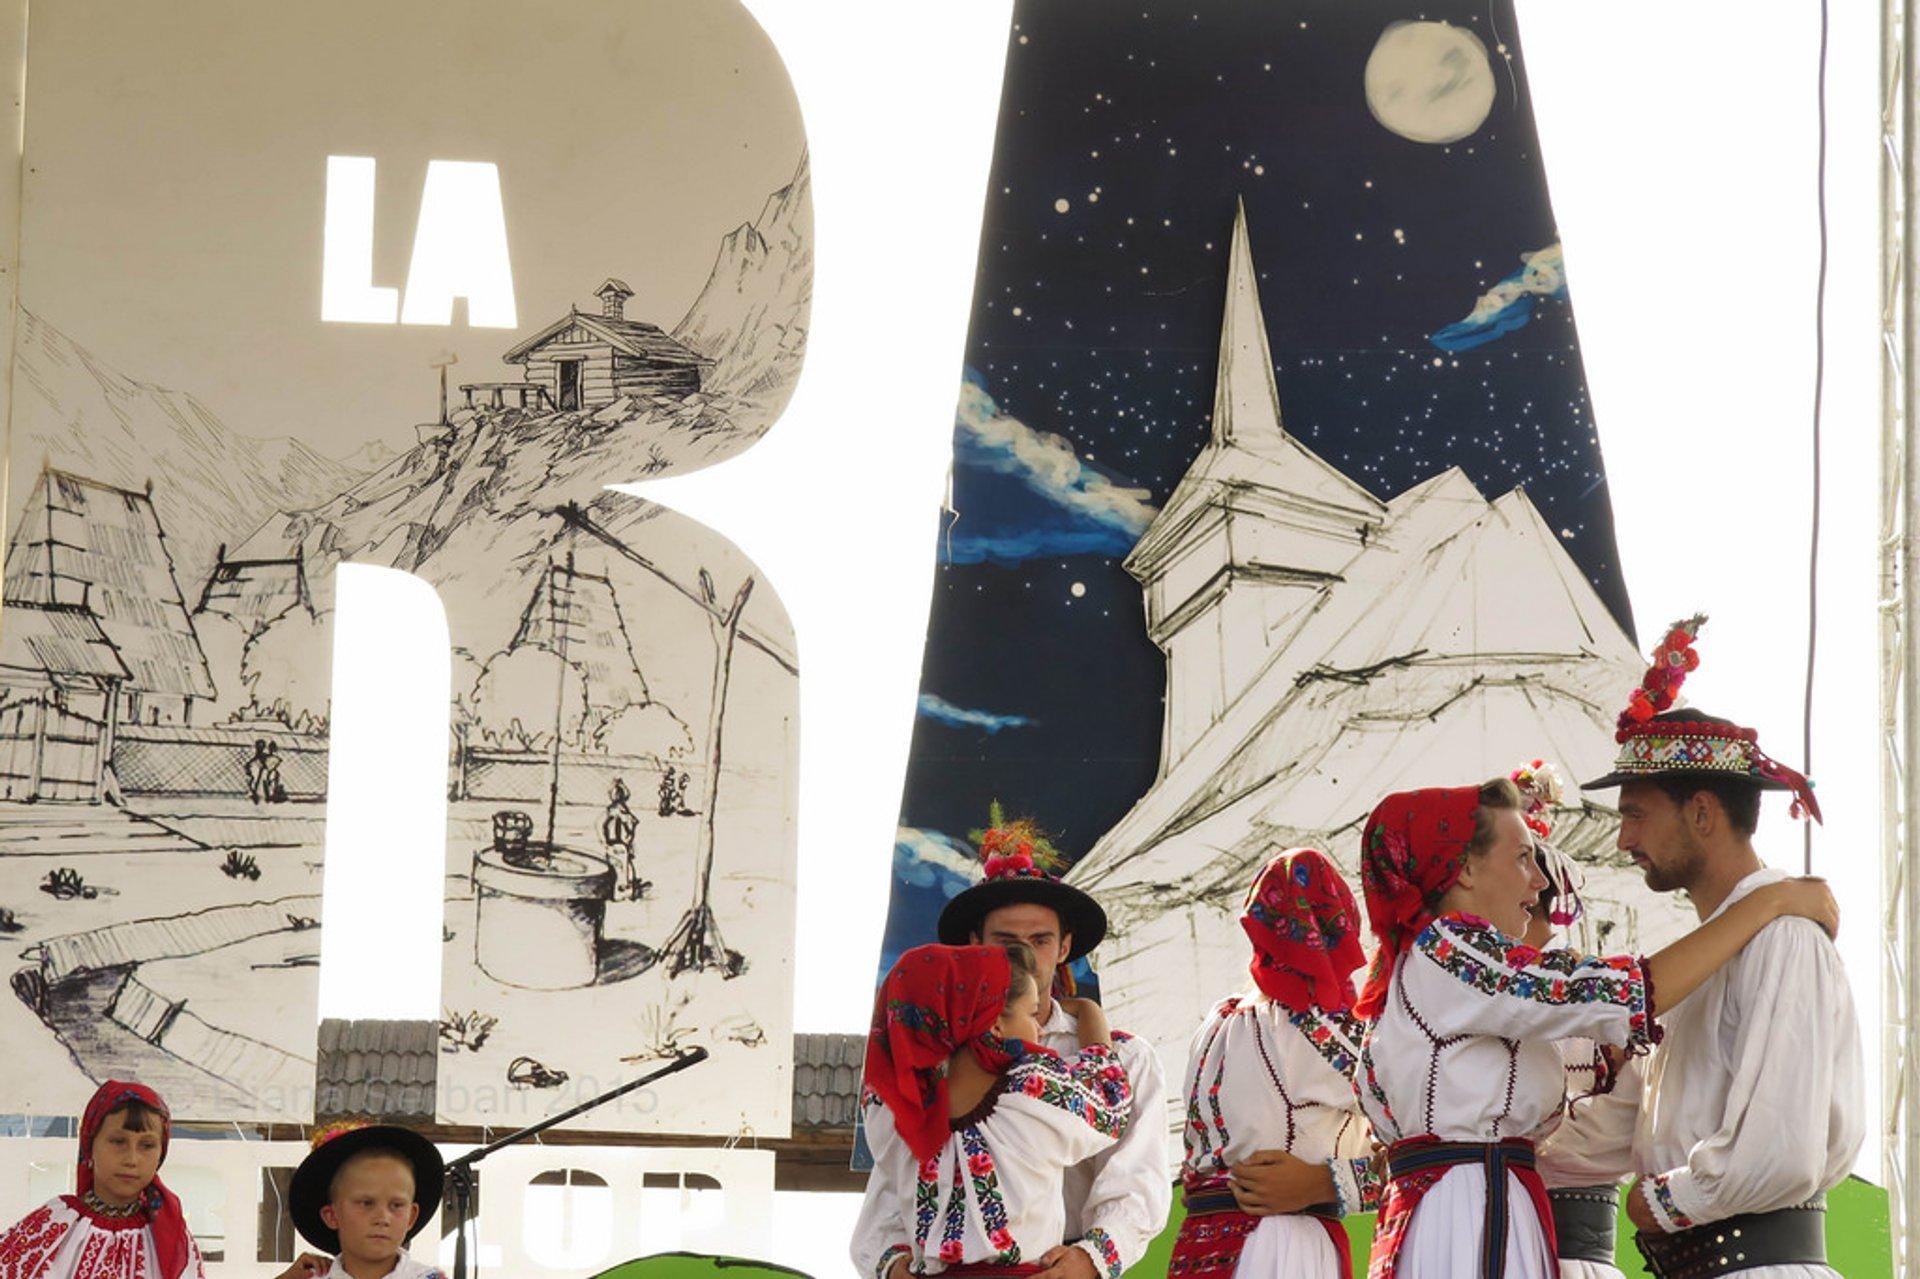 Prislop Pass Folk Festival in Romania 2019 - Best Time